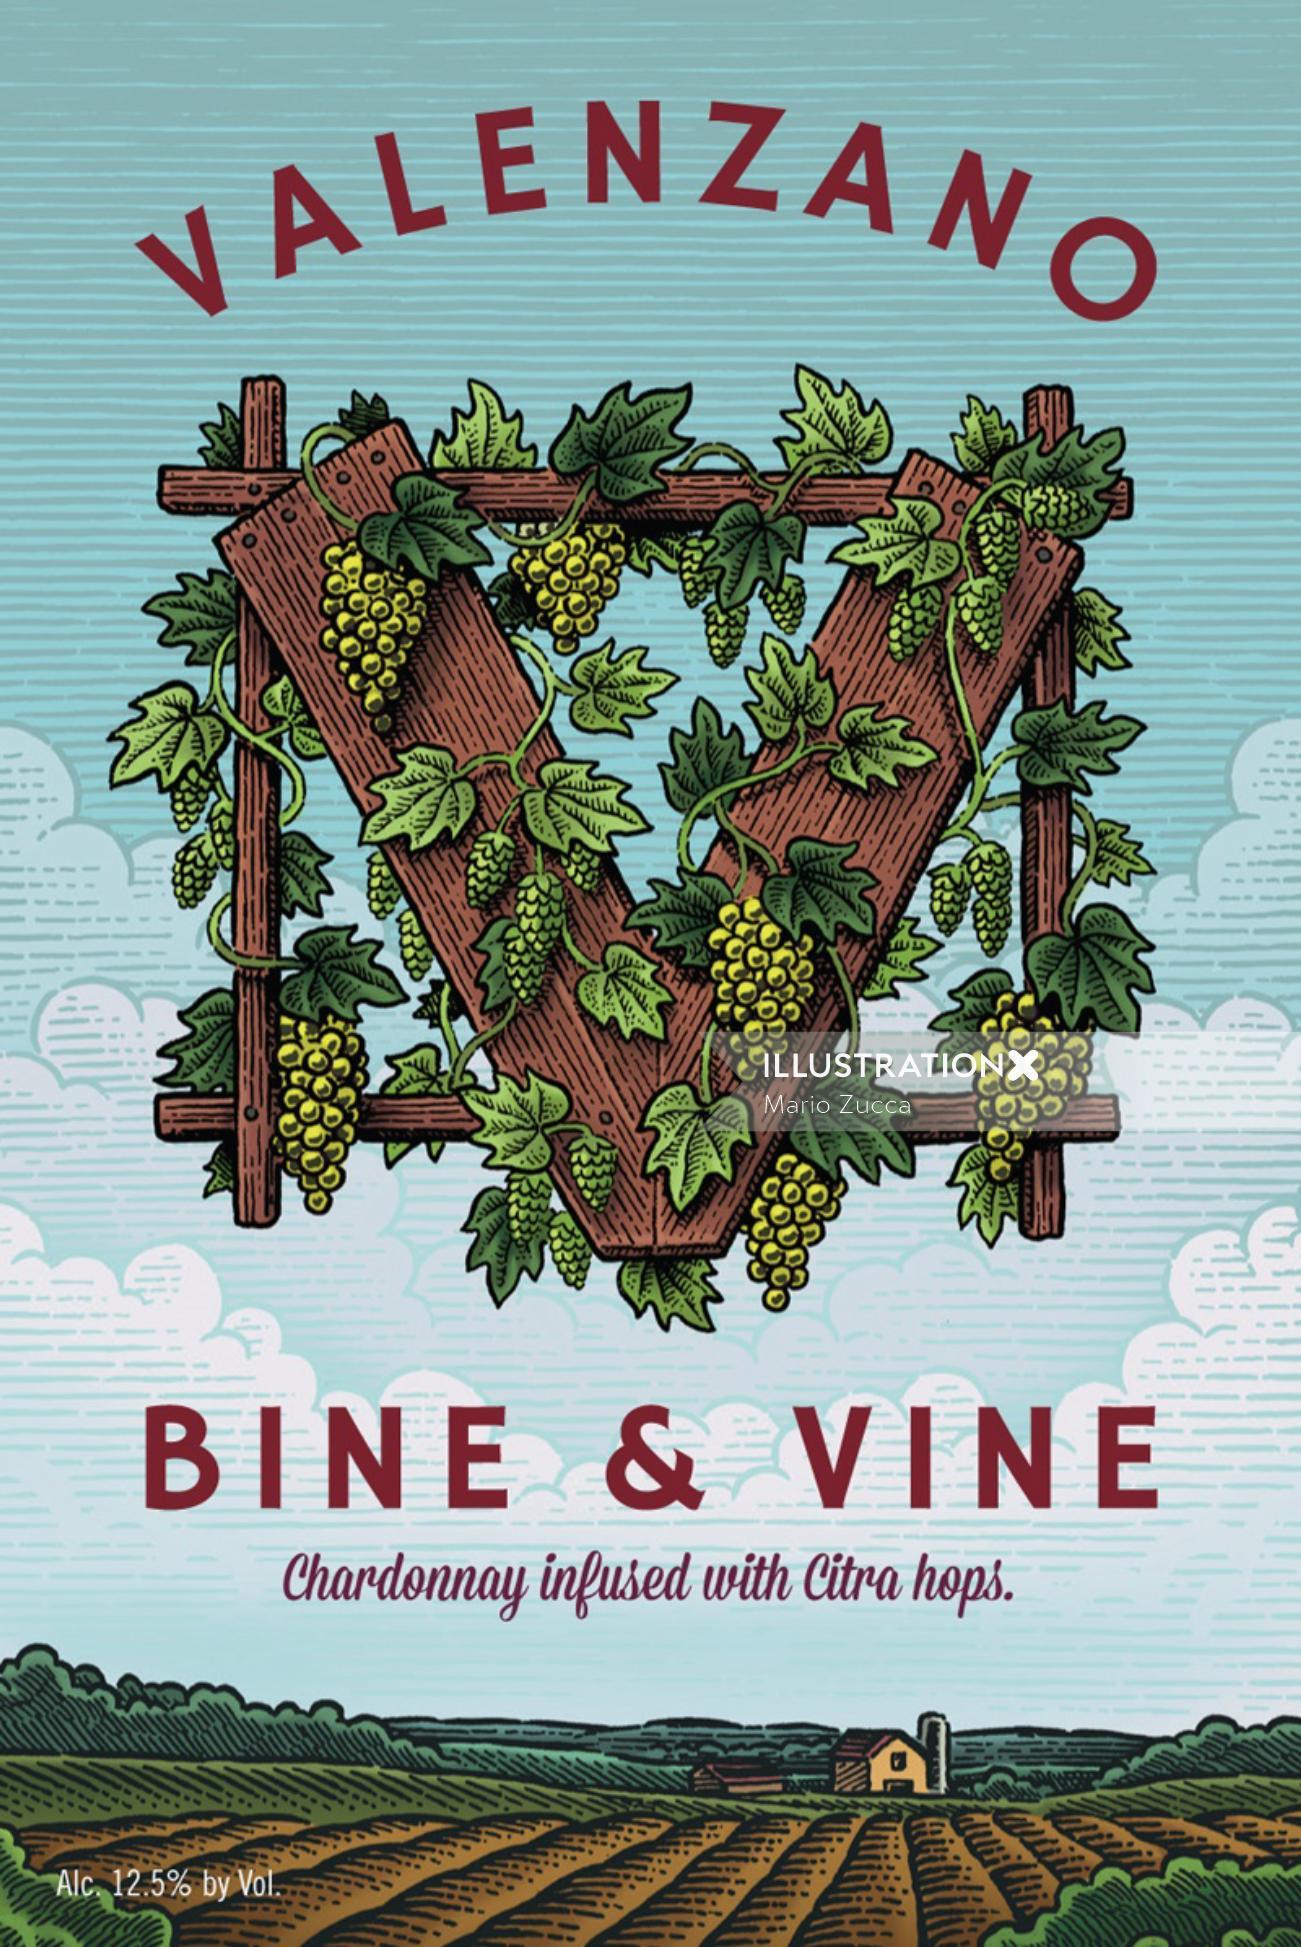 Hand lettering for Valenzano Bine & Vine Label